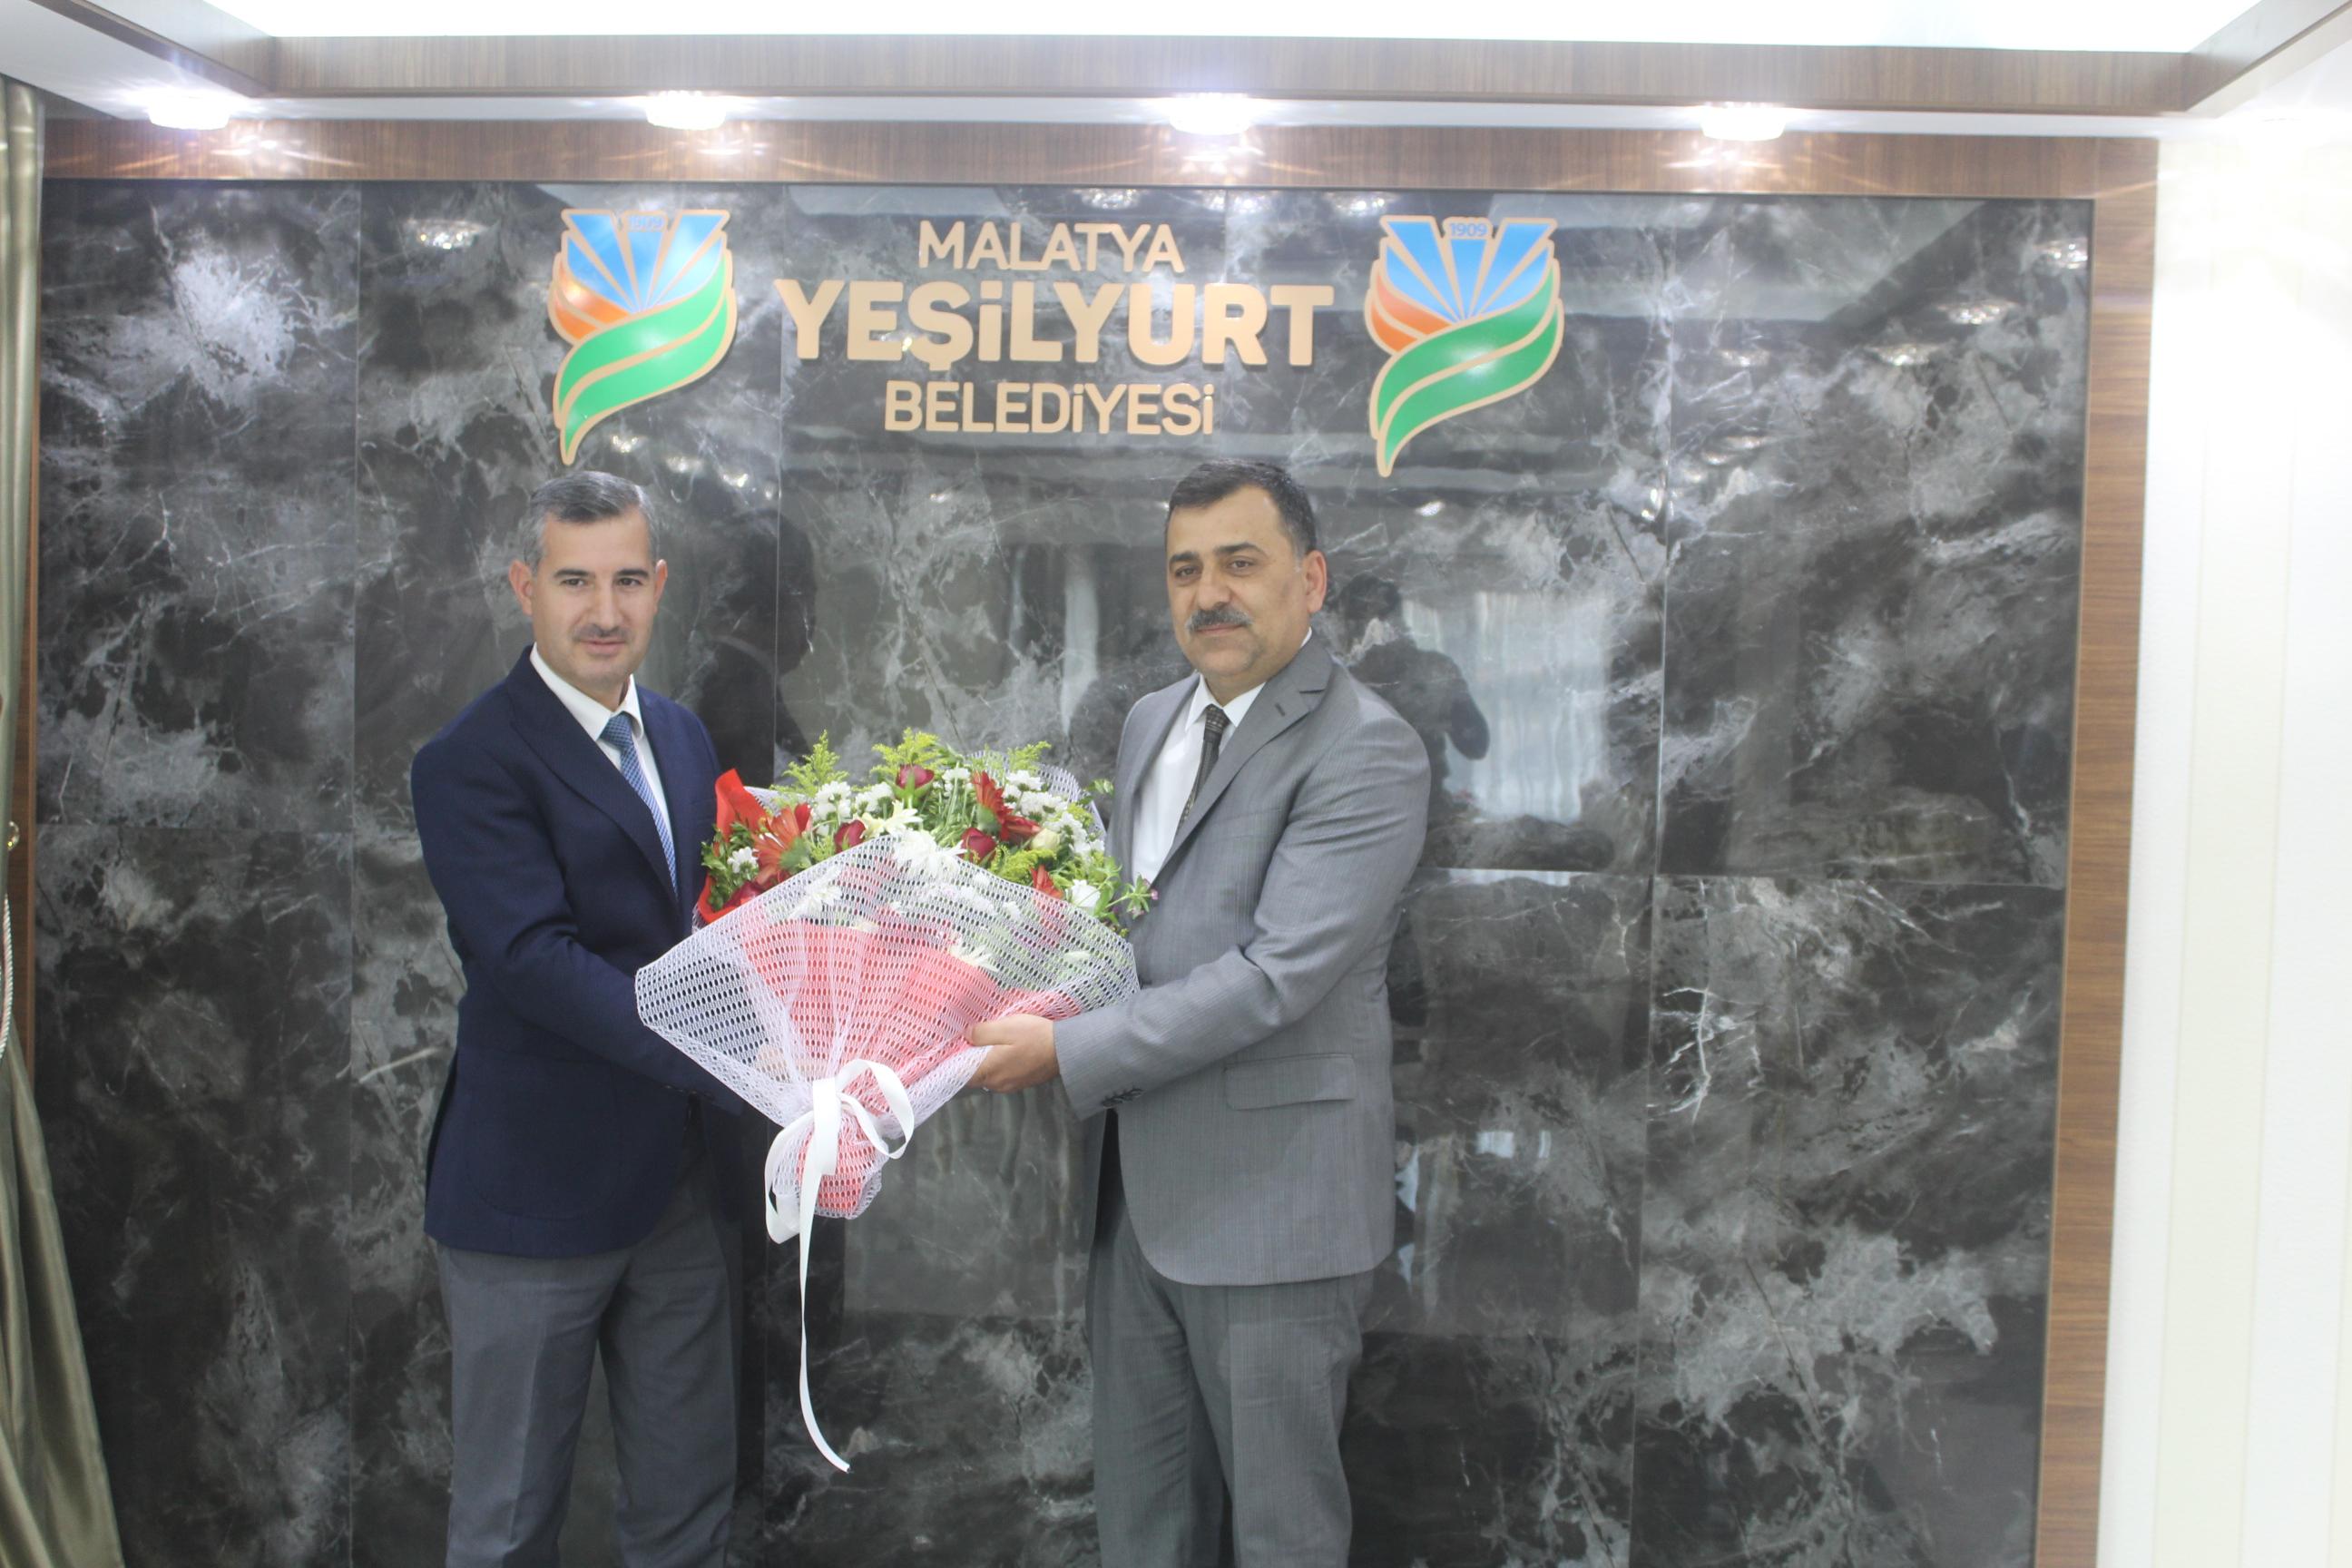 http://webdosya.csb.gov.tr/db/malatya/haberler/img_9043-20180607123928.JPG